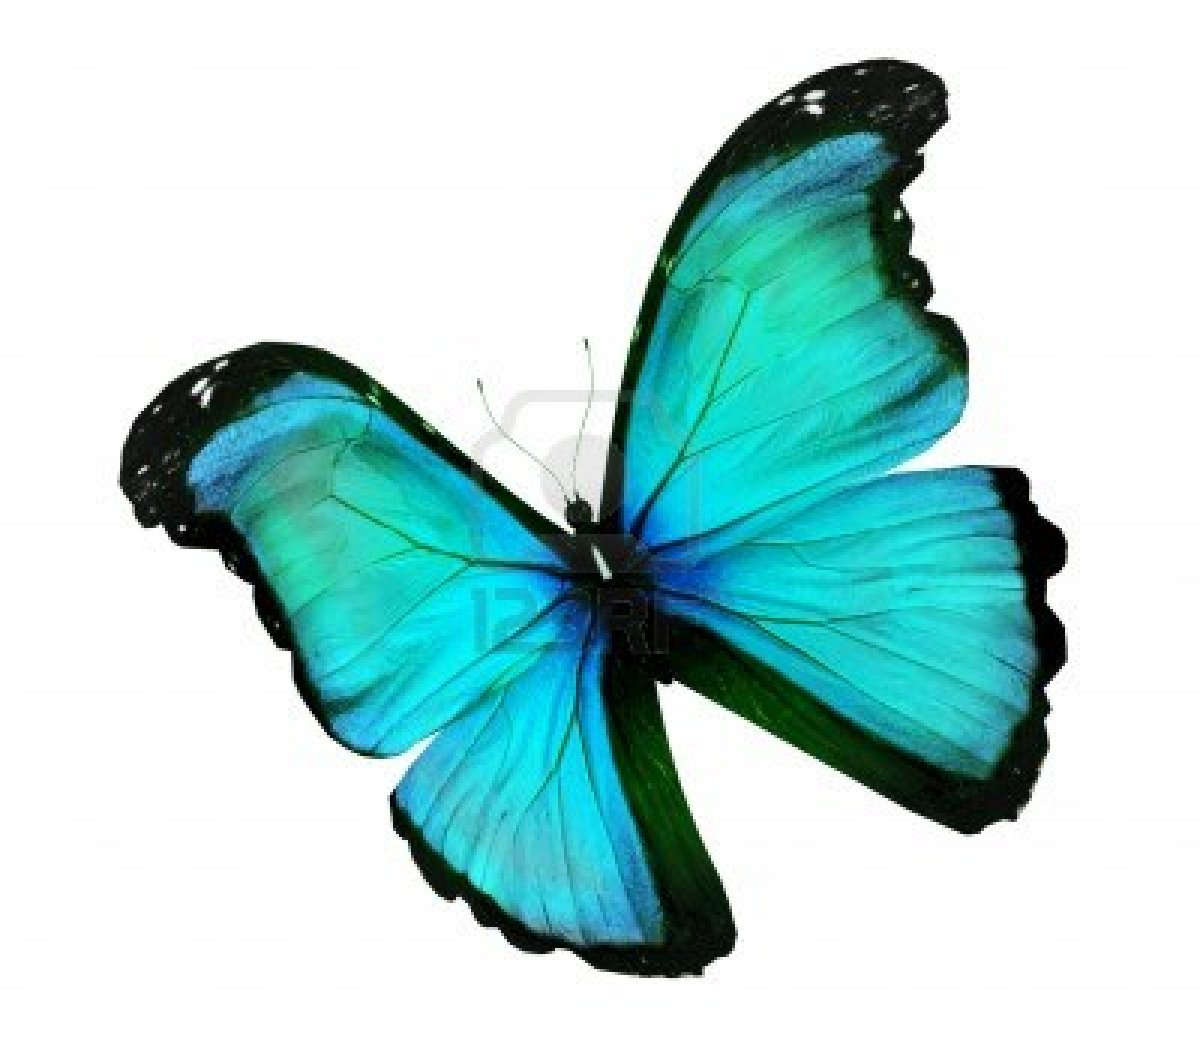 papillon bleu dessin images galleries with a bite. Black Bedroom Furniture Sets. Home Design Ideas